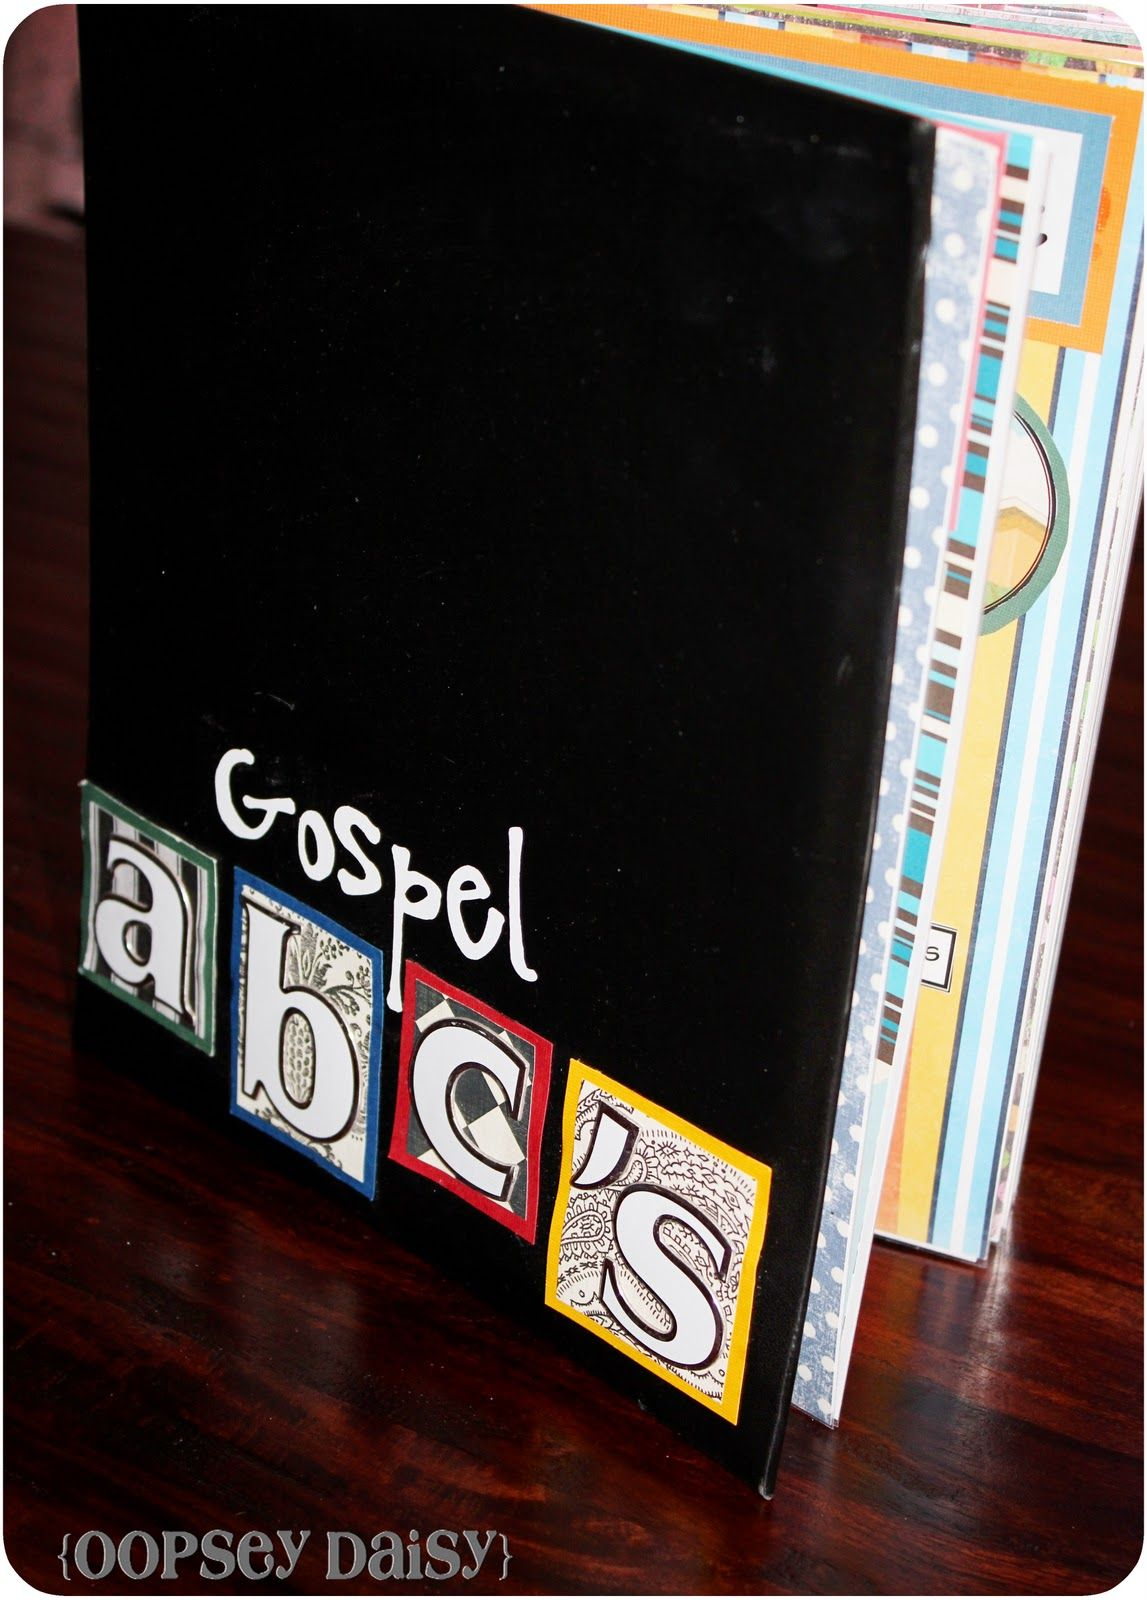 How to make scrapbook look good - Gospel Abc Scrapbook Oopsey Daisy Good Ideas Minus The Mormon Part